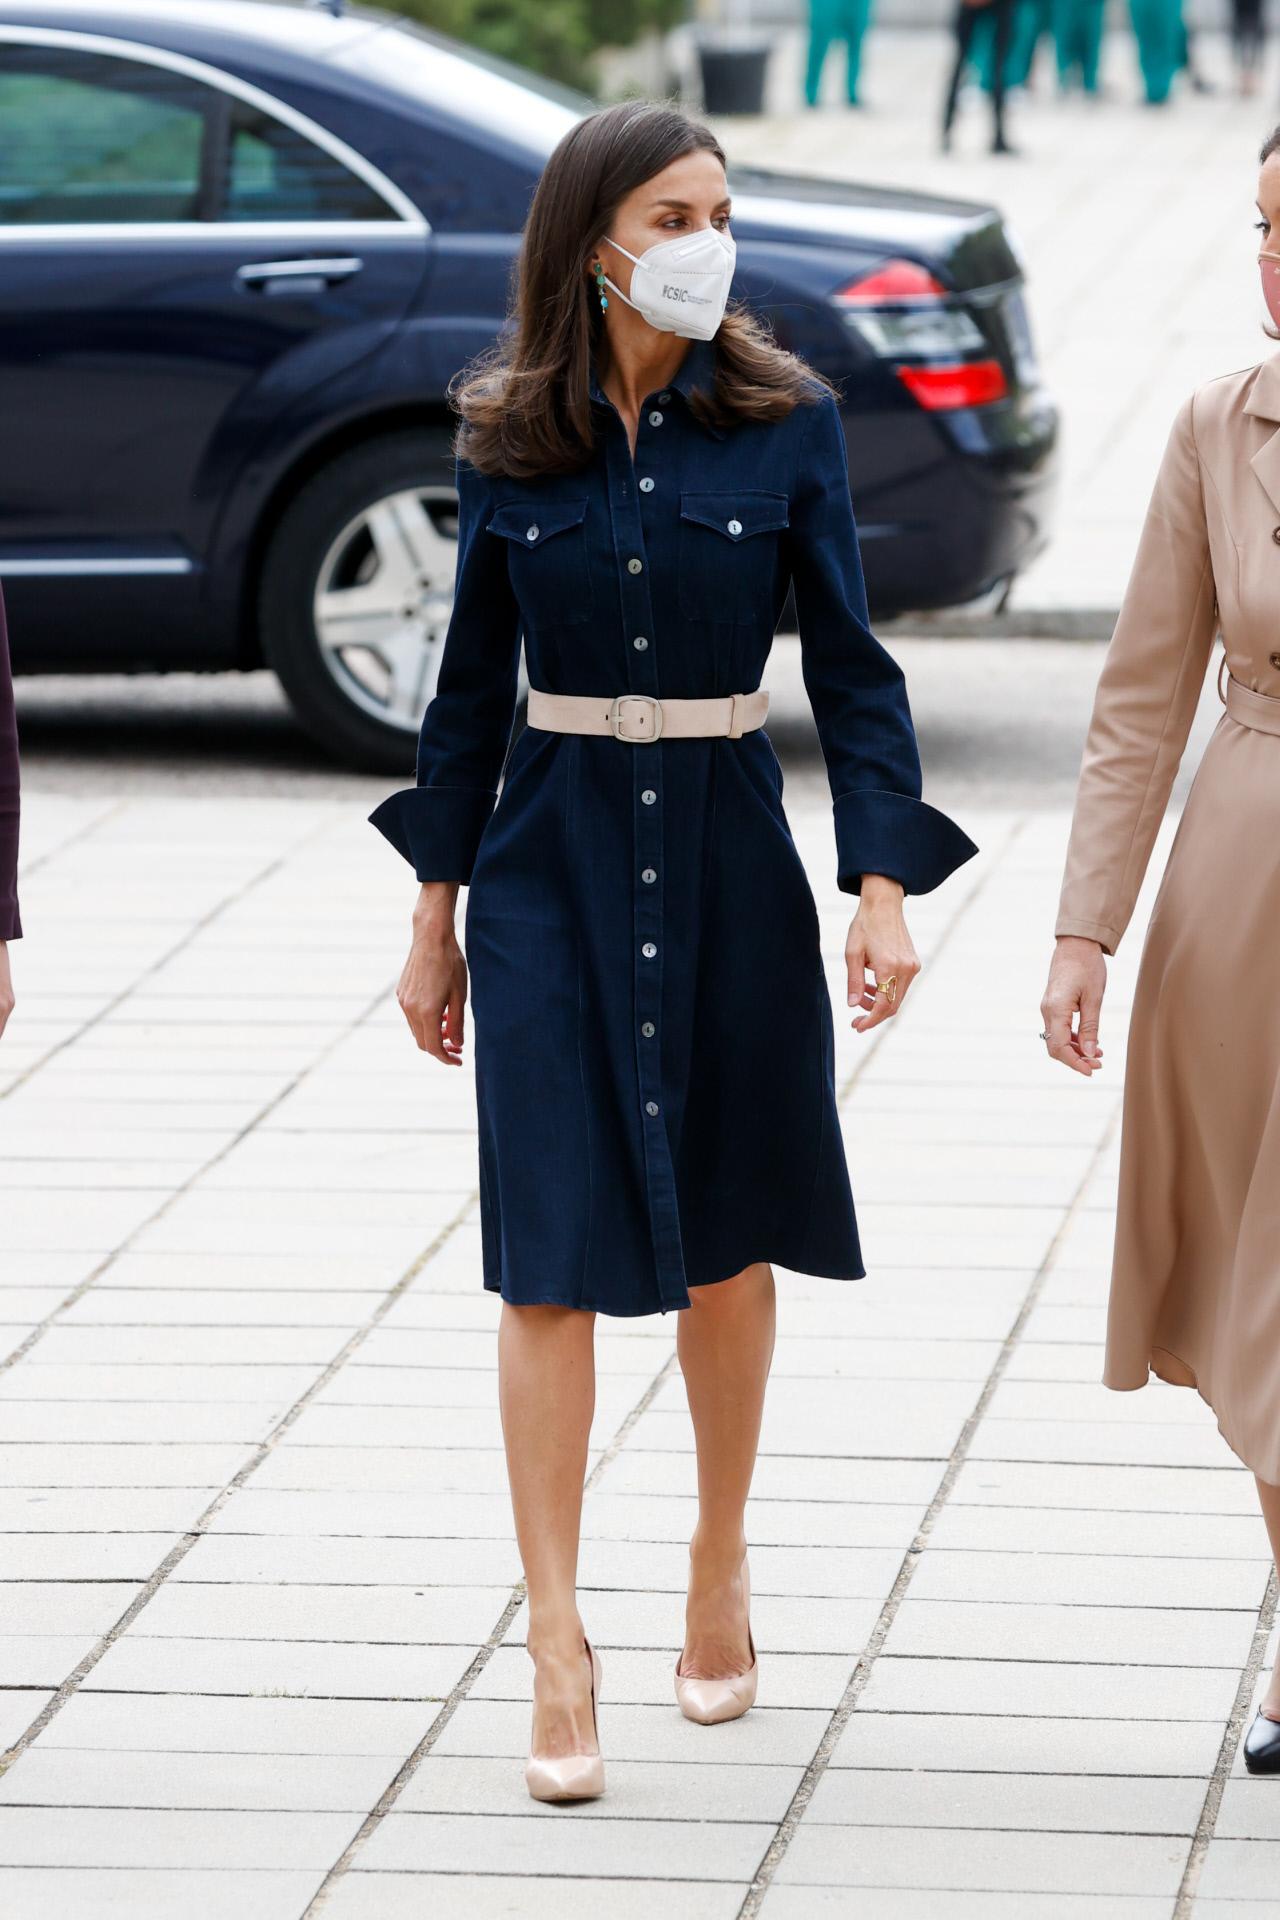 La reina Letizia con vestido vaquero.